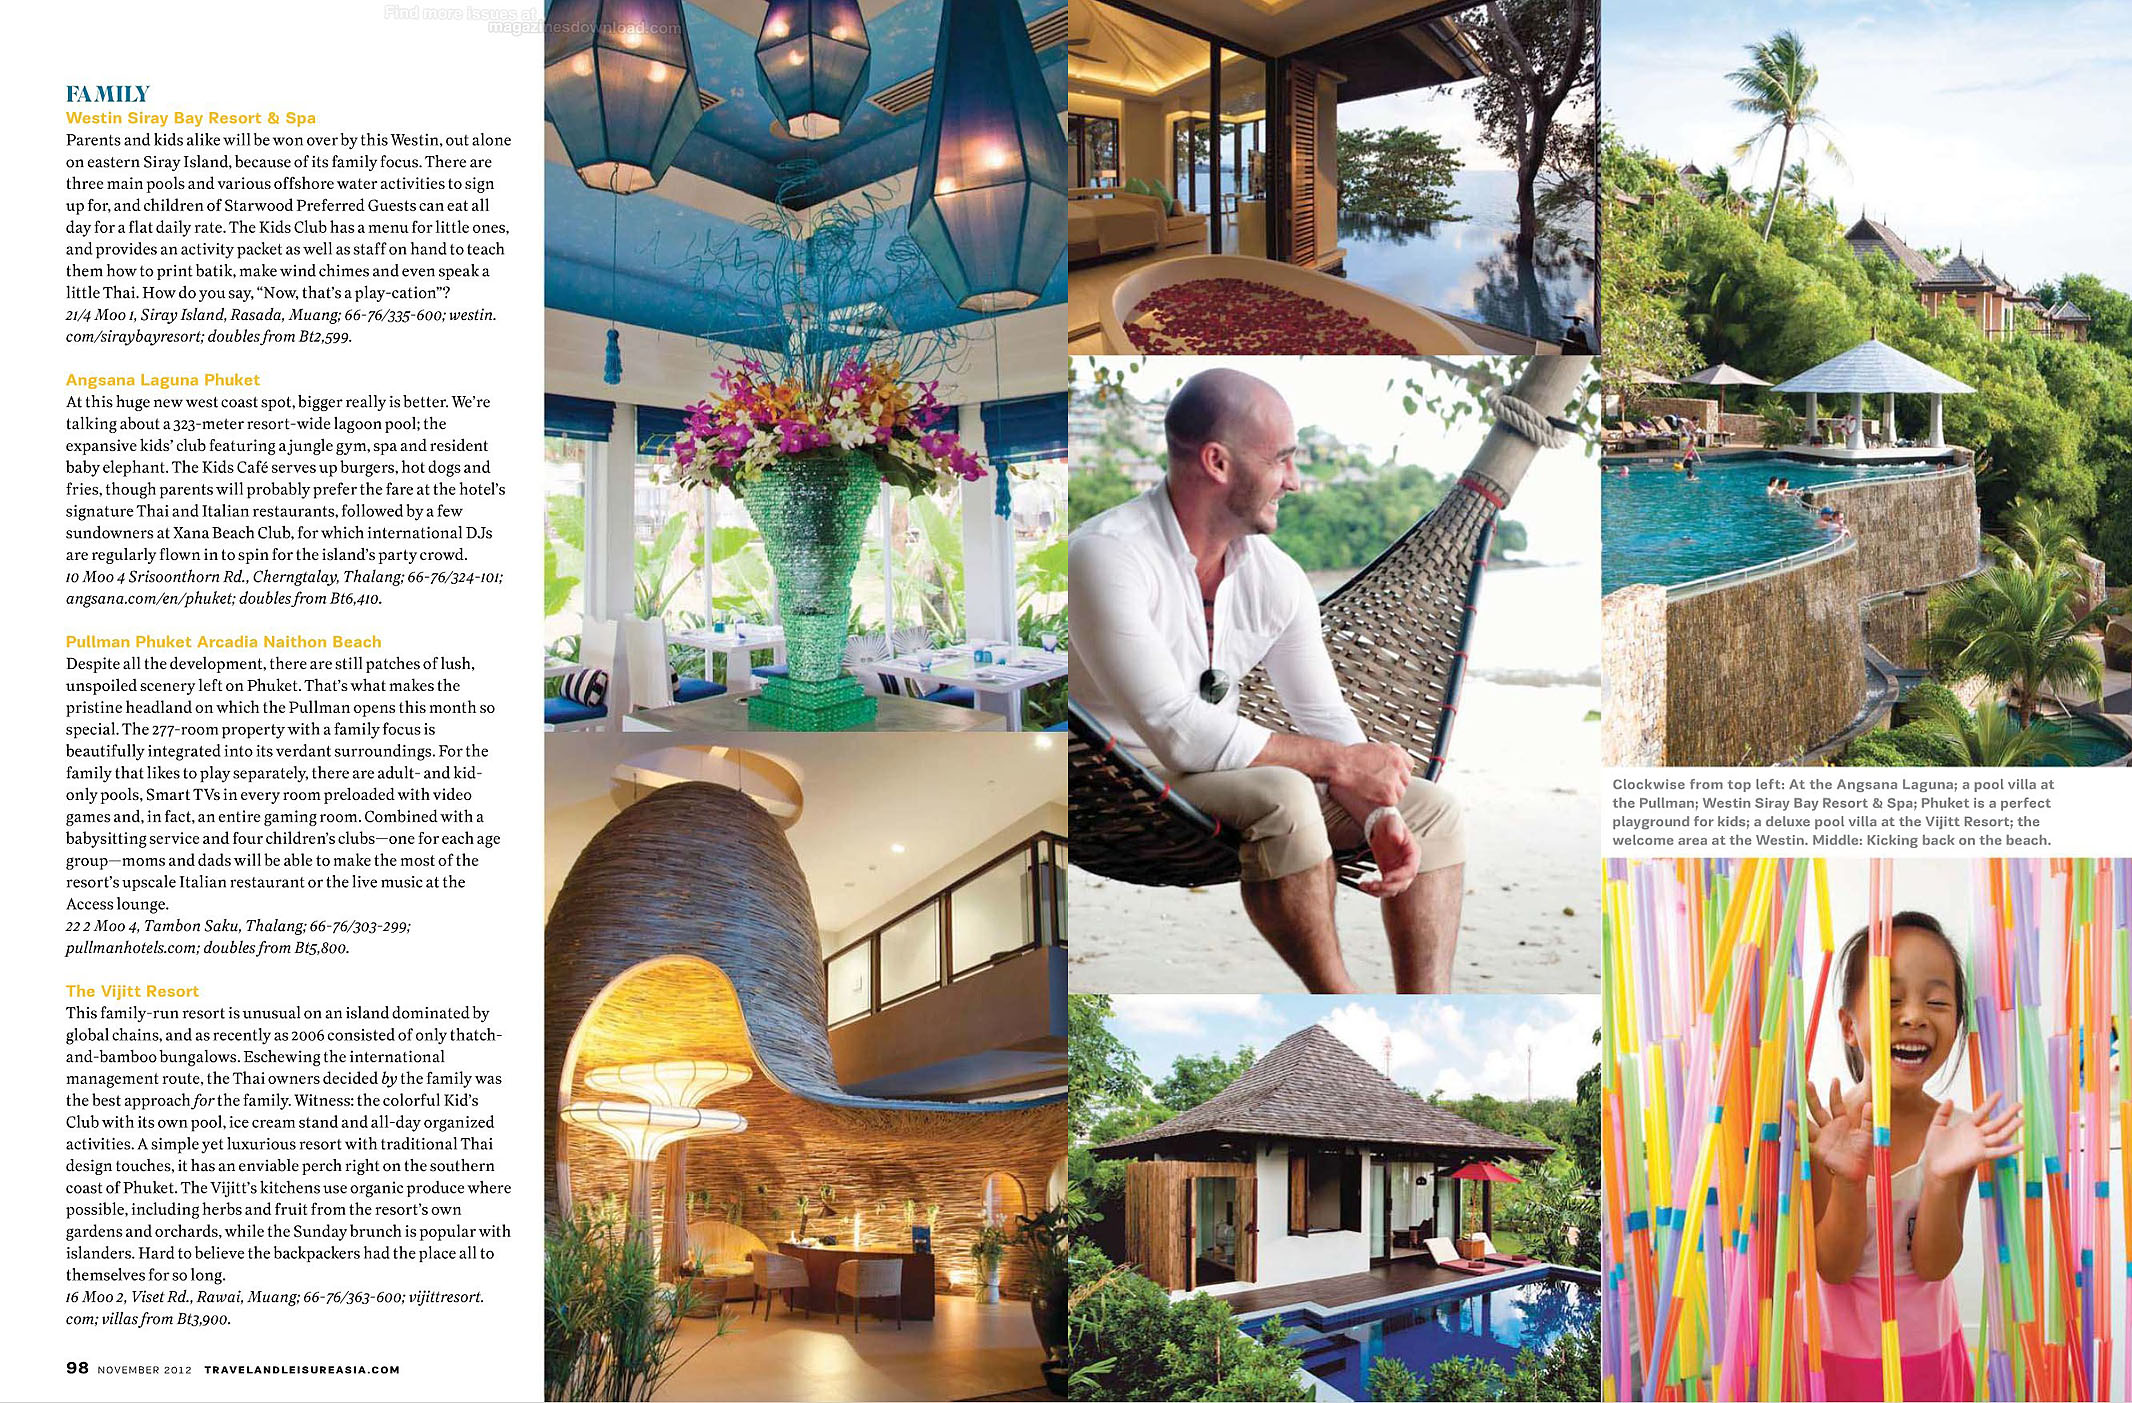 Travel & Leisure SA 2012-11-04.jpg